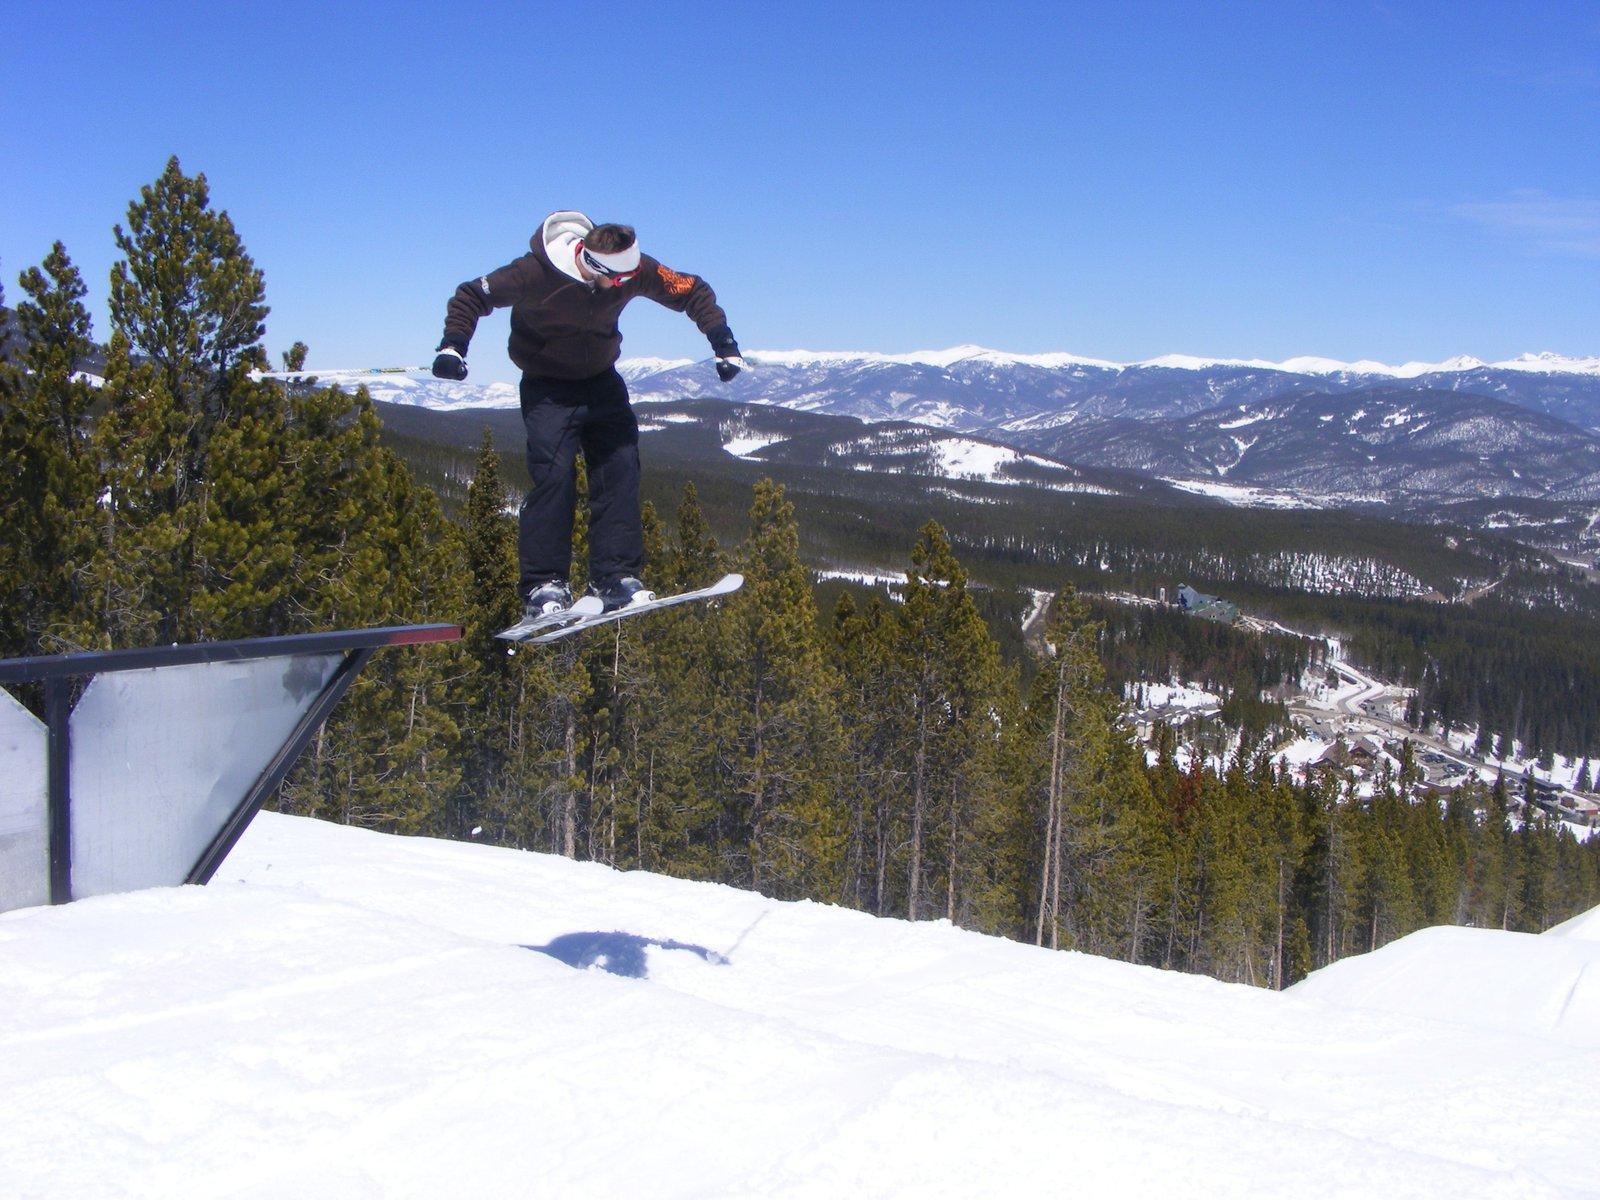 Breck flatrail